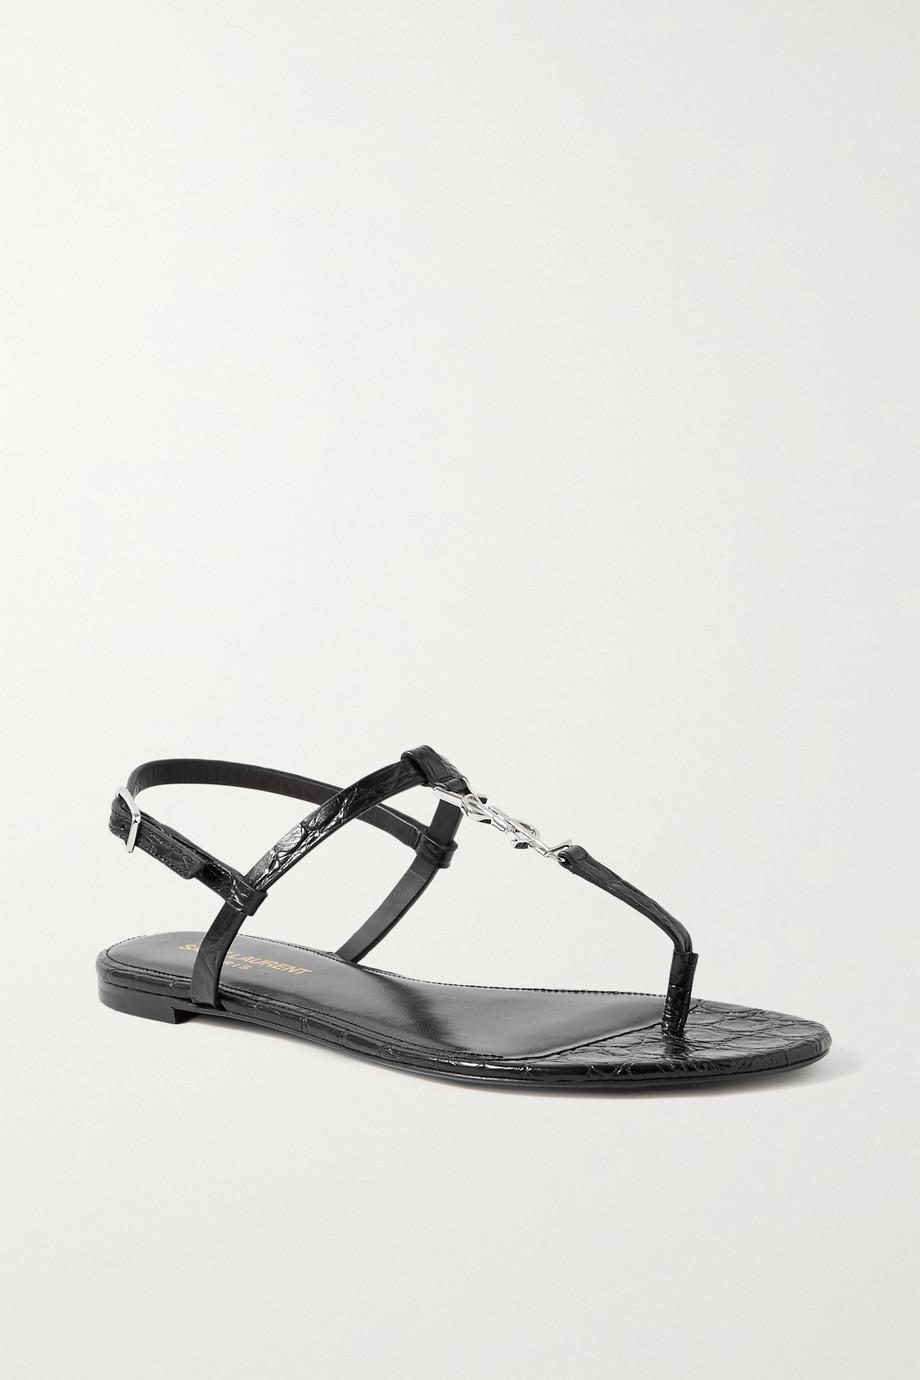 SAINT LAURENT Cassandra logo-embellished croc-effect leather sandals